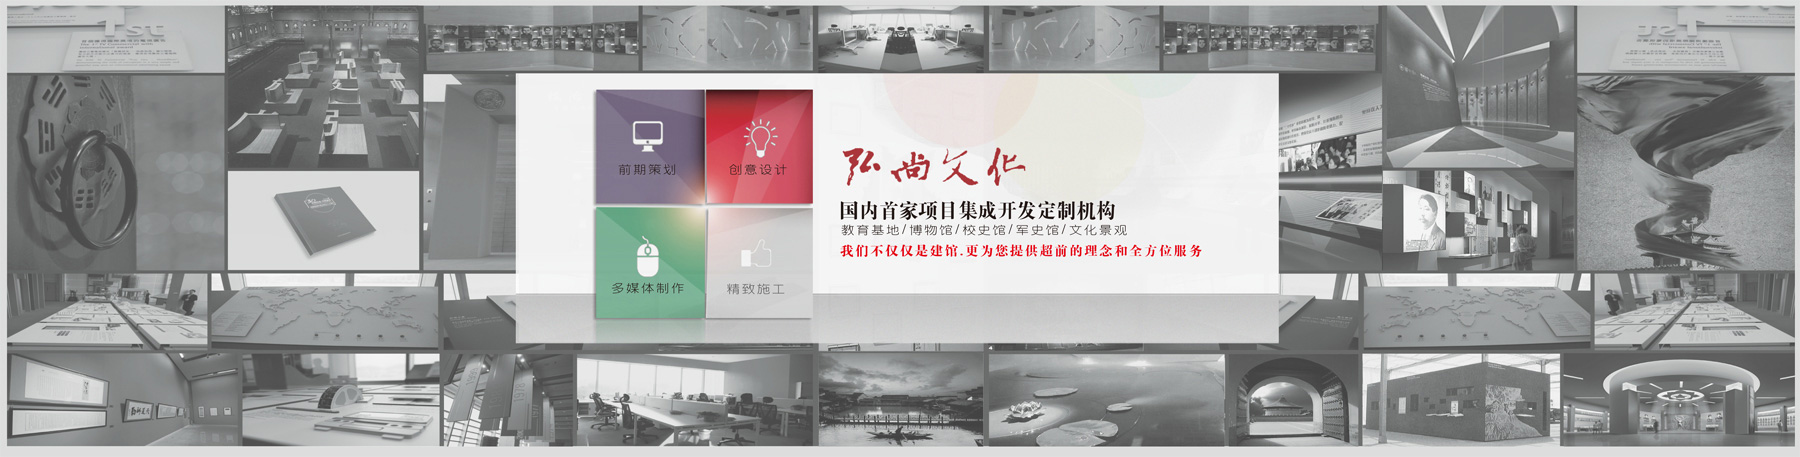 bob官方文化